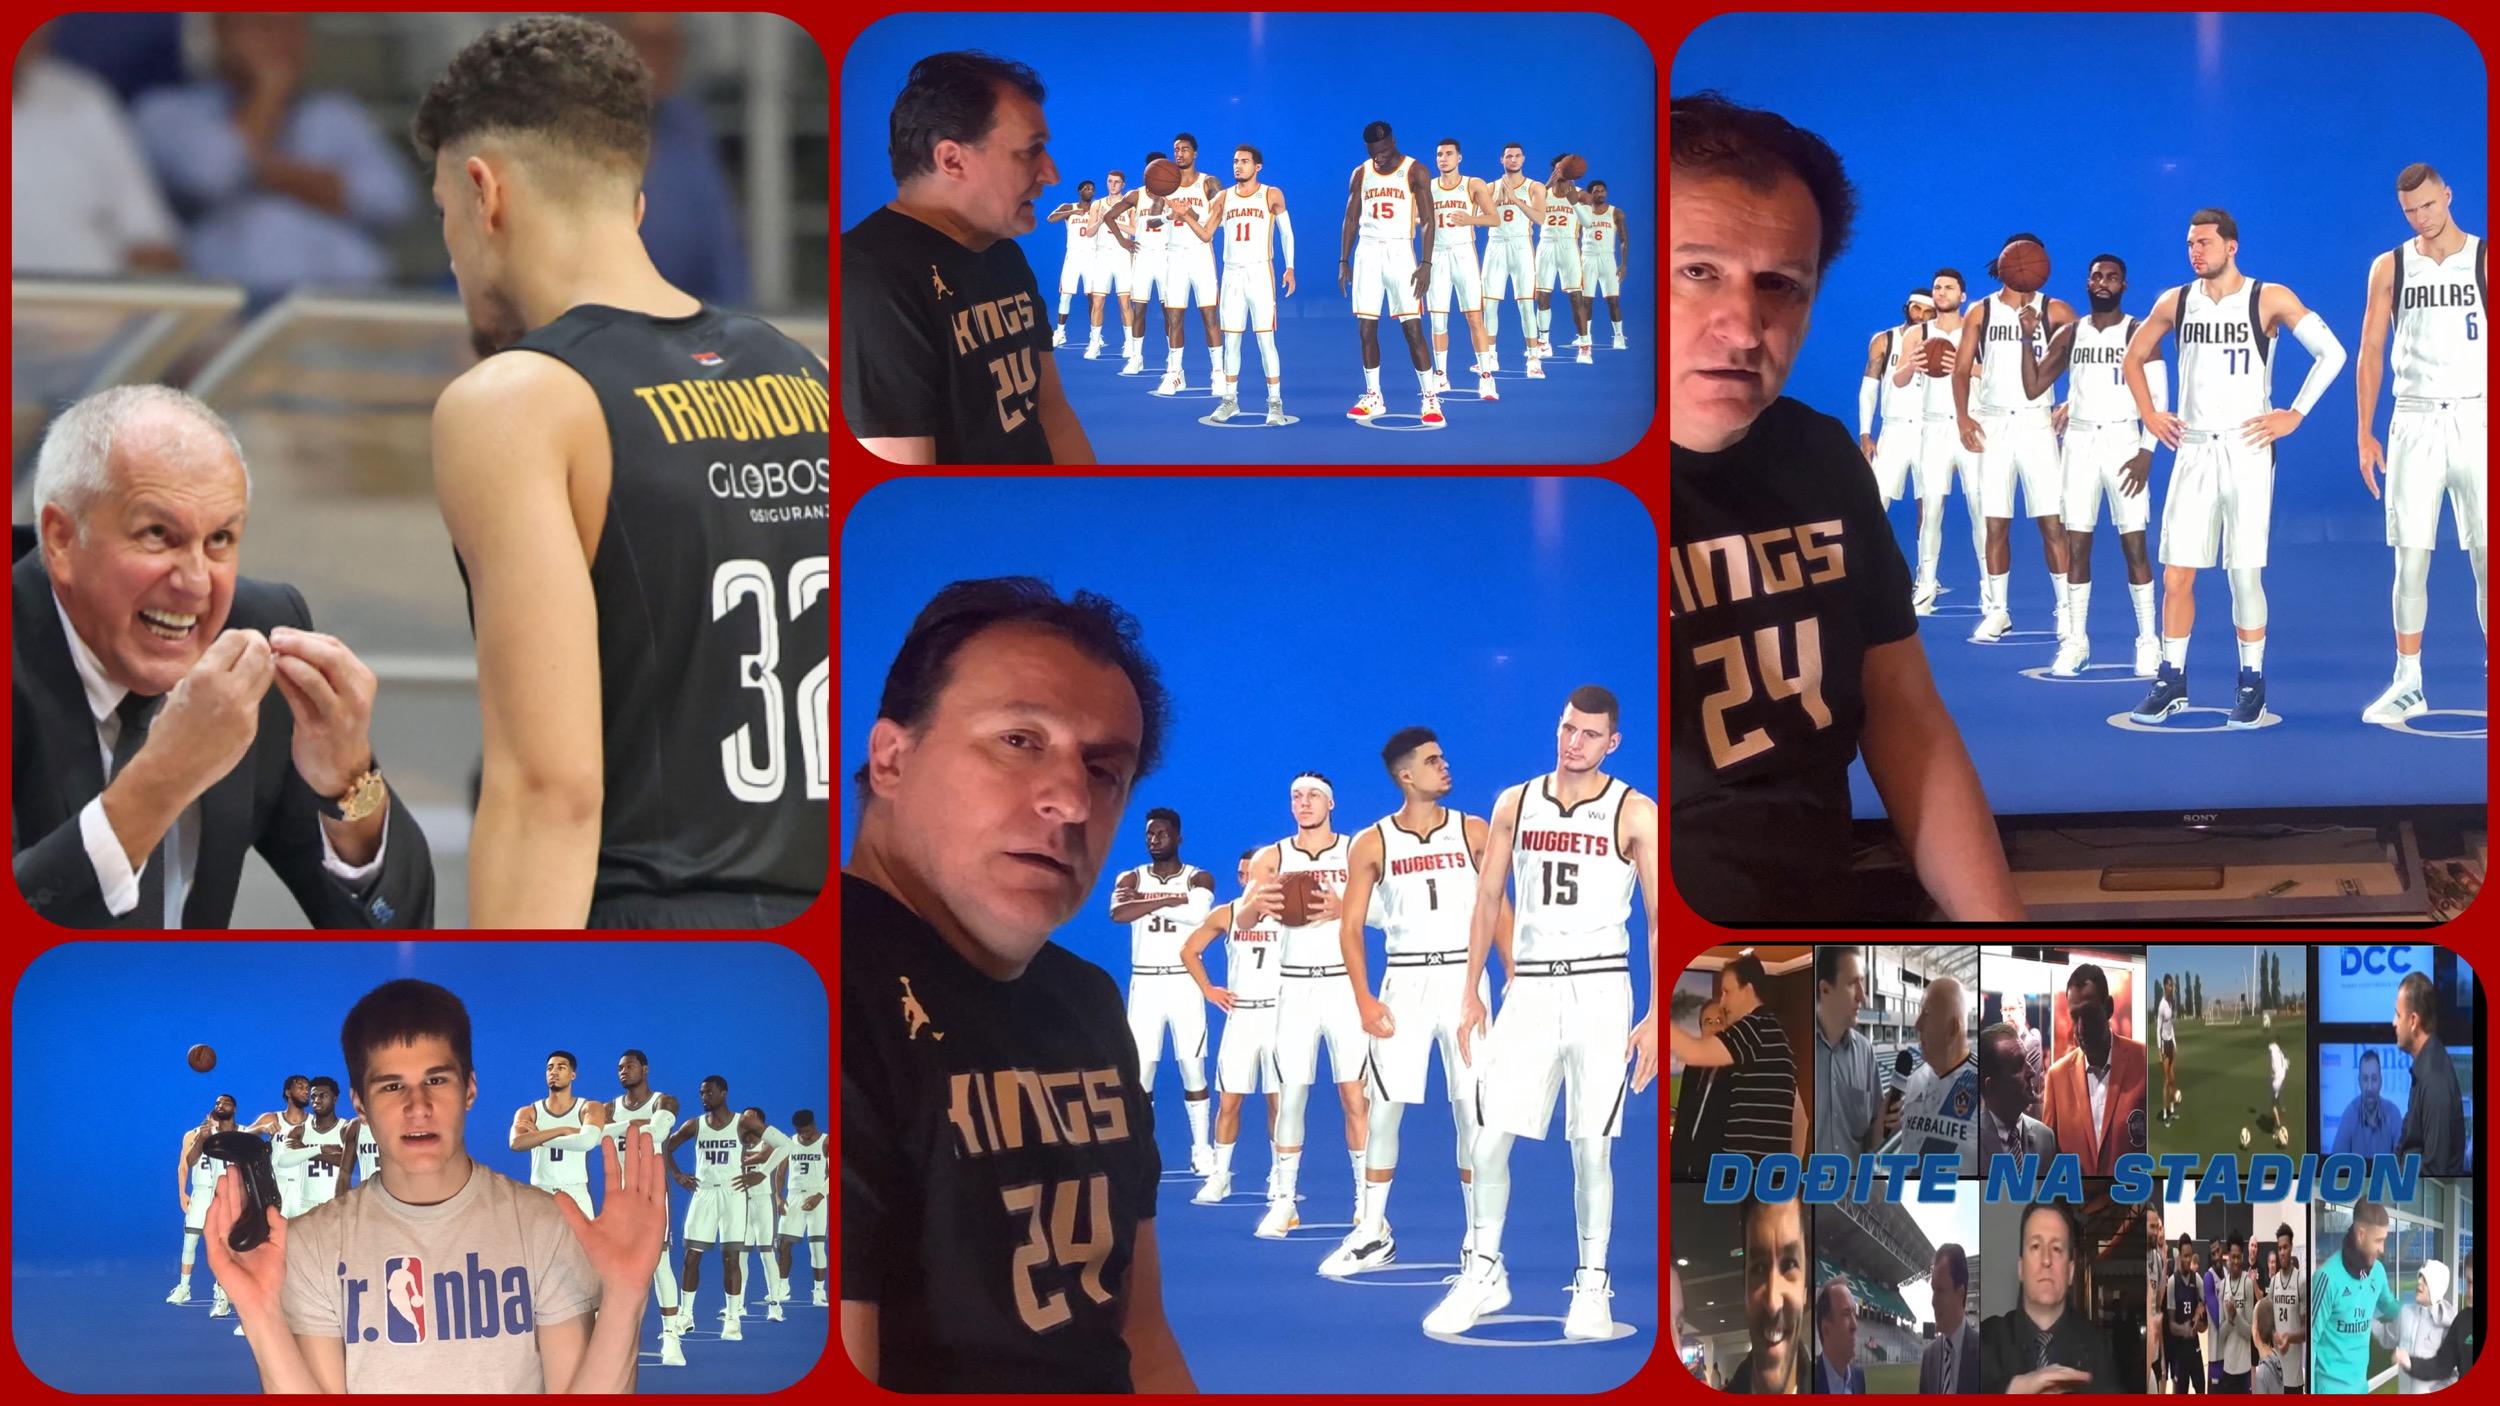 Željko Pantić: NBA Europe Specijal-Partizanov Rebuild i predstavljanje rostera svih 30 NBA timova…(VIDEO)